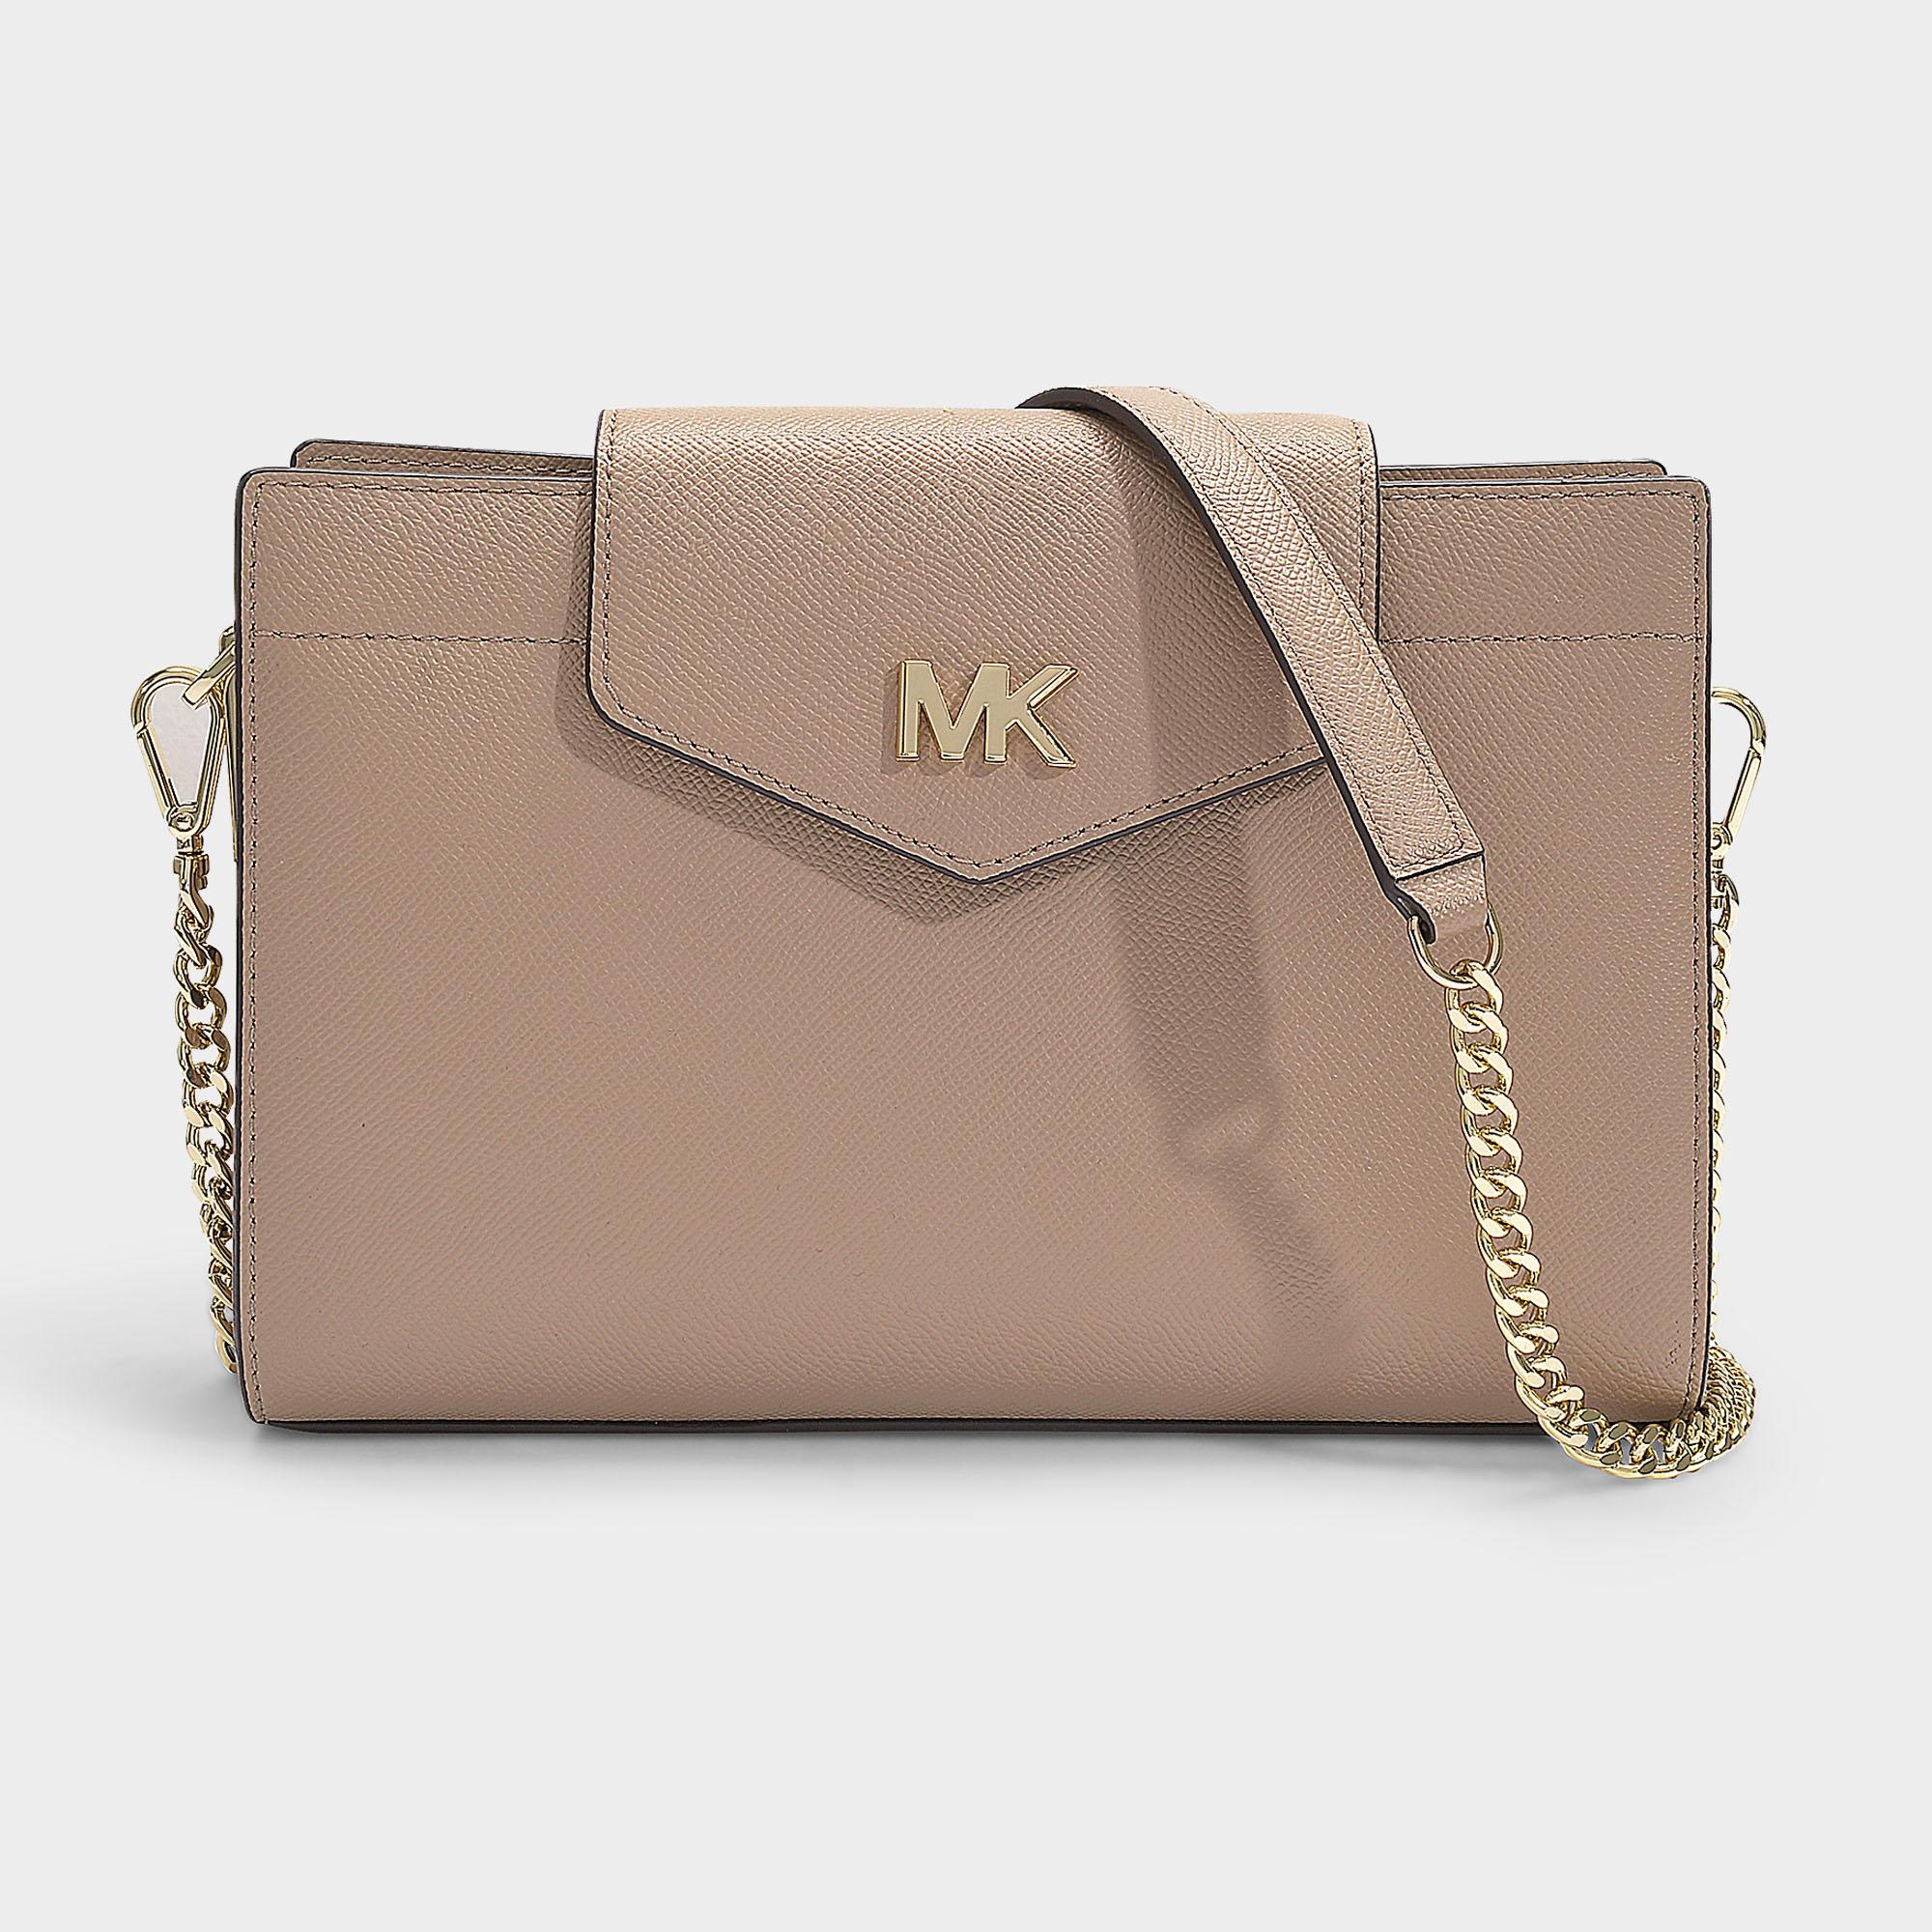 395ba8c75ffffc Michael Michael Kors | Crossbodies Large Convertible Crossbody Clutch Bag  In Black Grained Calfskin In Beige